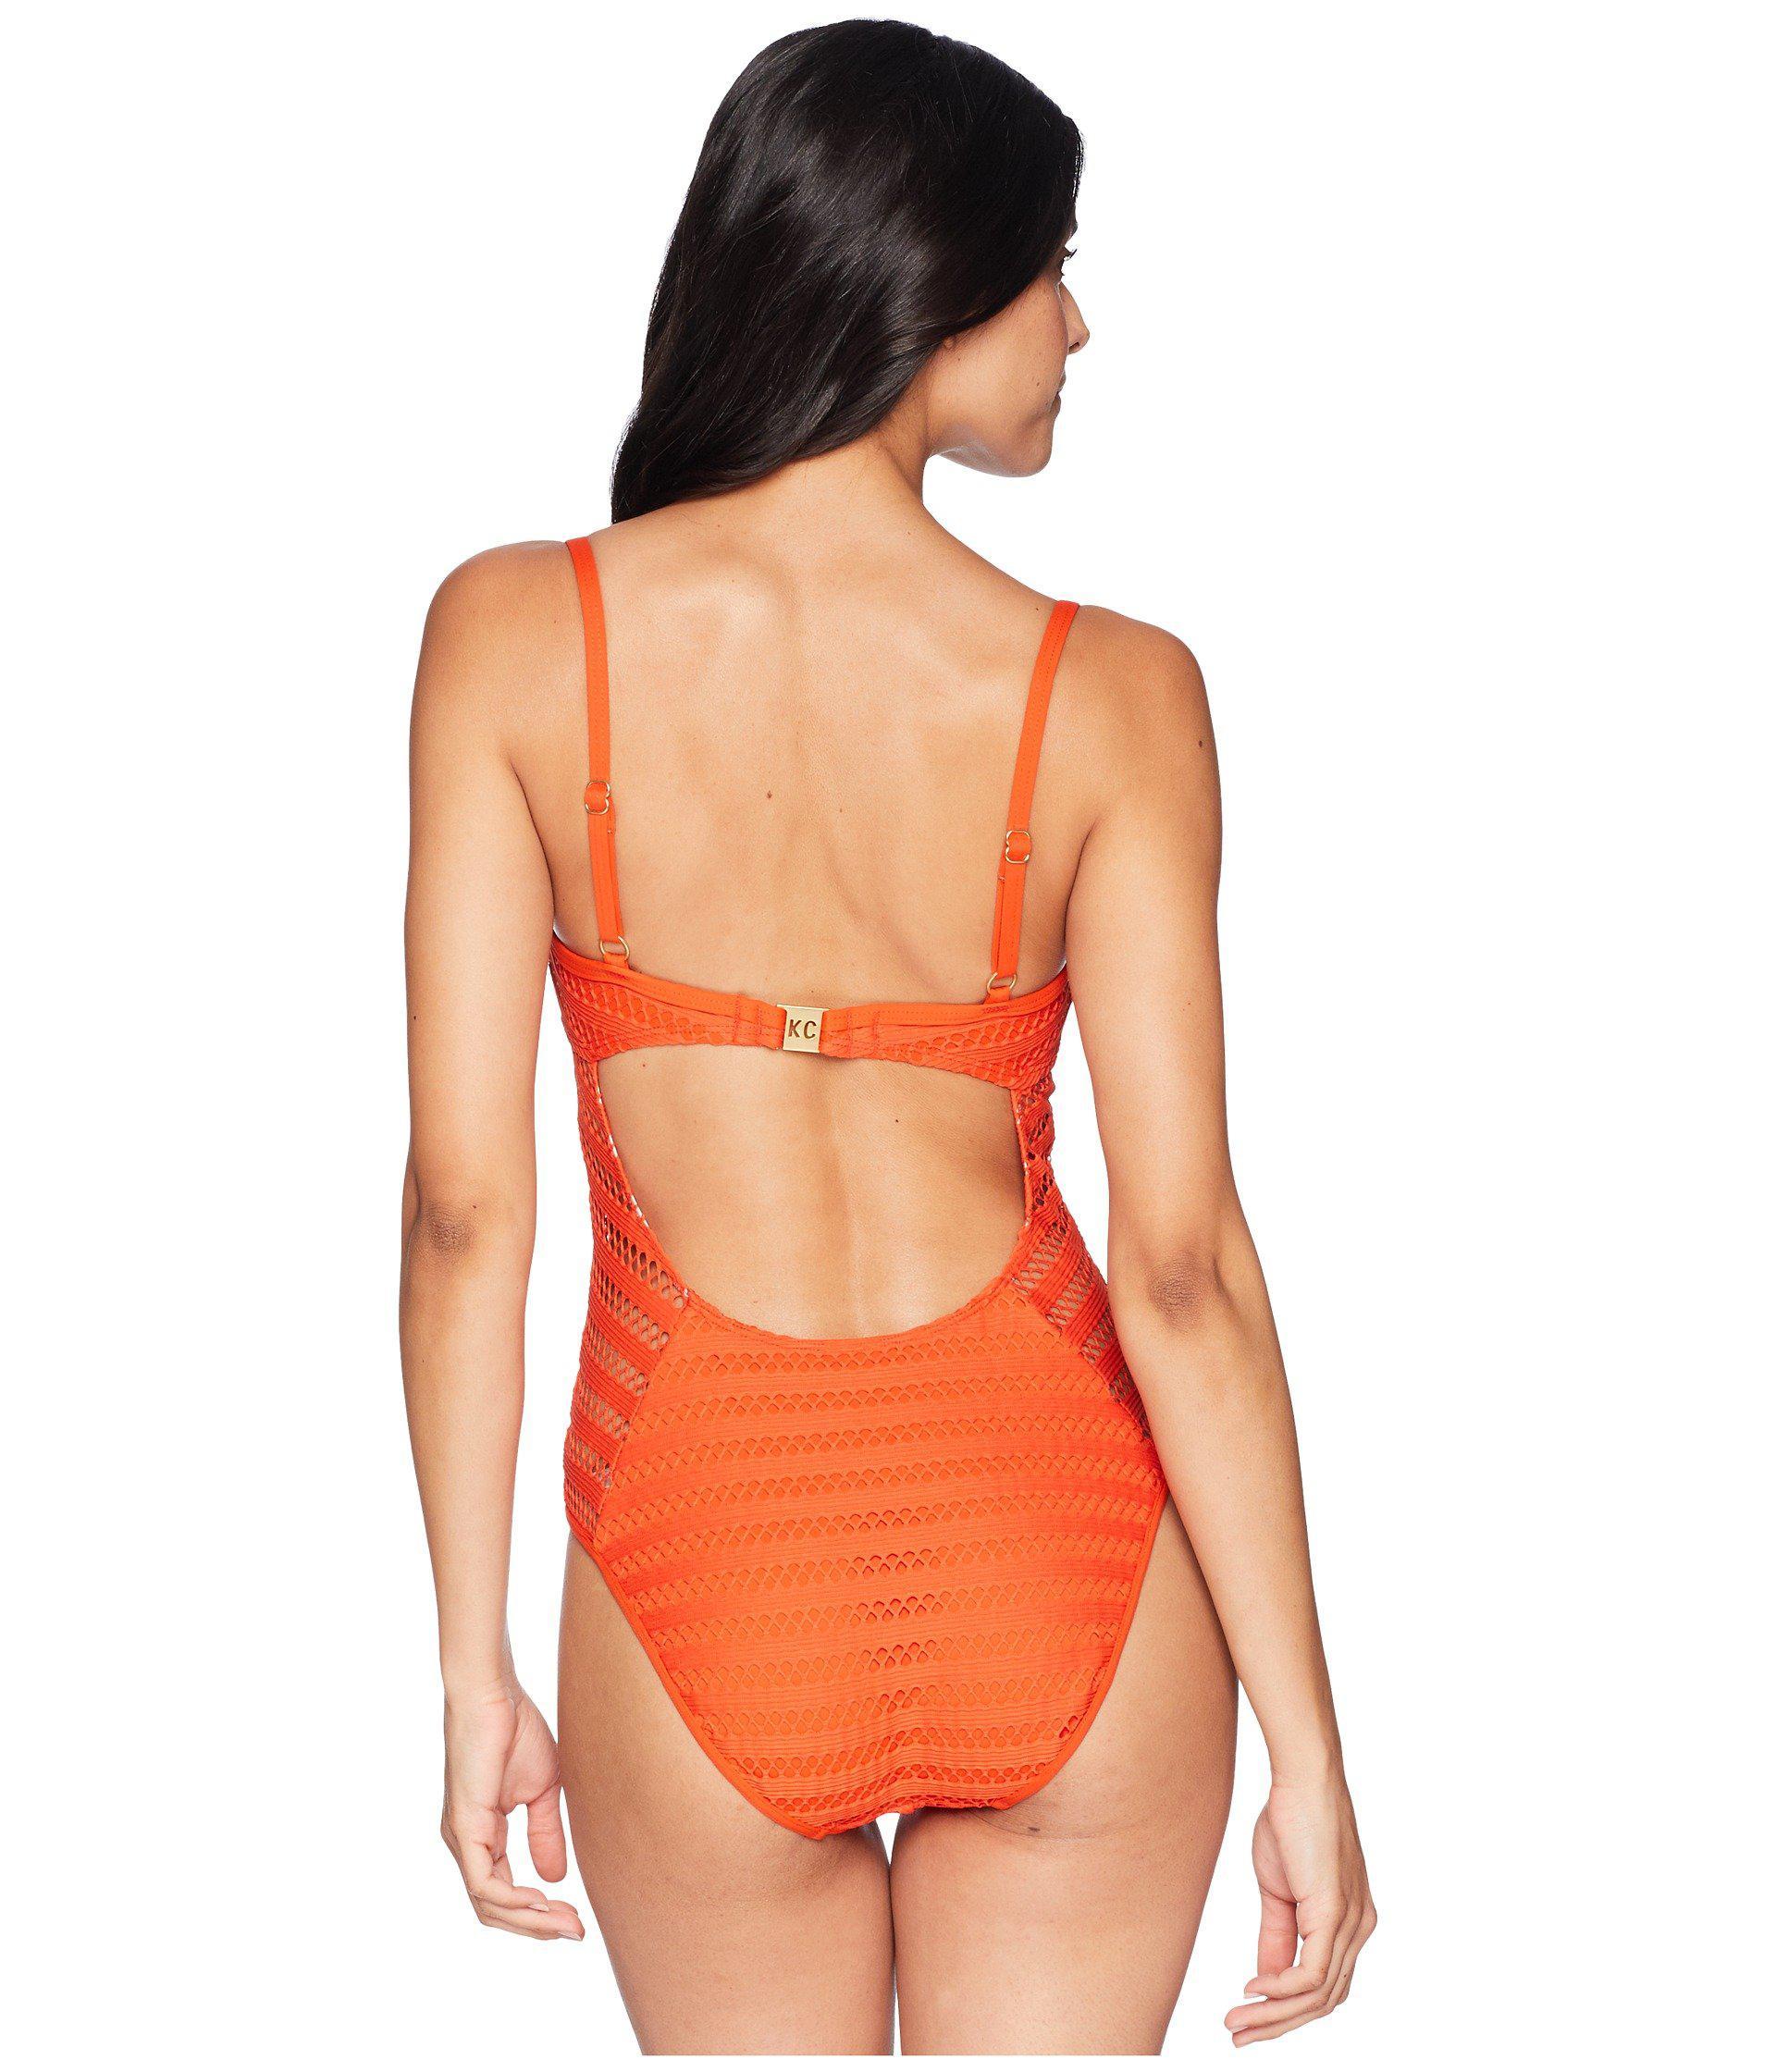 bf4b674245 Kenneth Cole - Orange Tough Luxe Mio - Lyst. View fullscreen